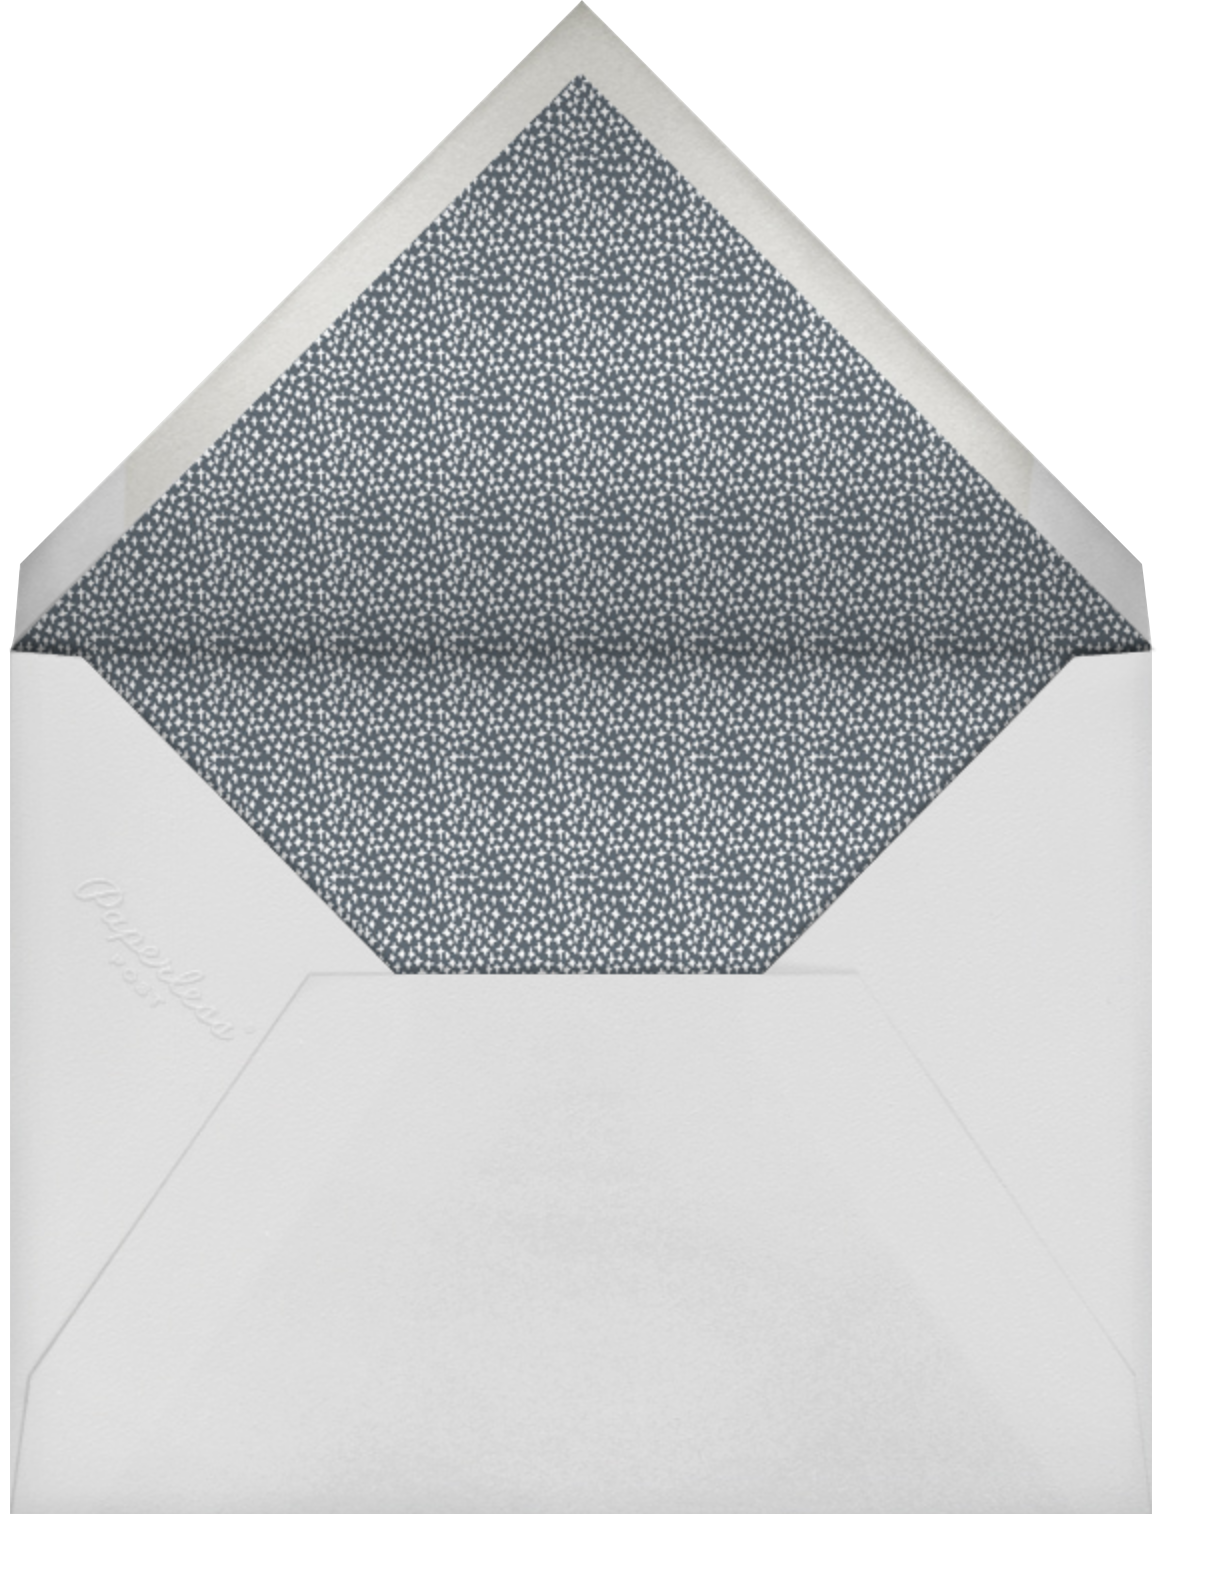 Laurel in Love - Sea Green - Mr. Boddington's Studio - All - envelope back